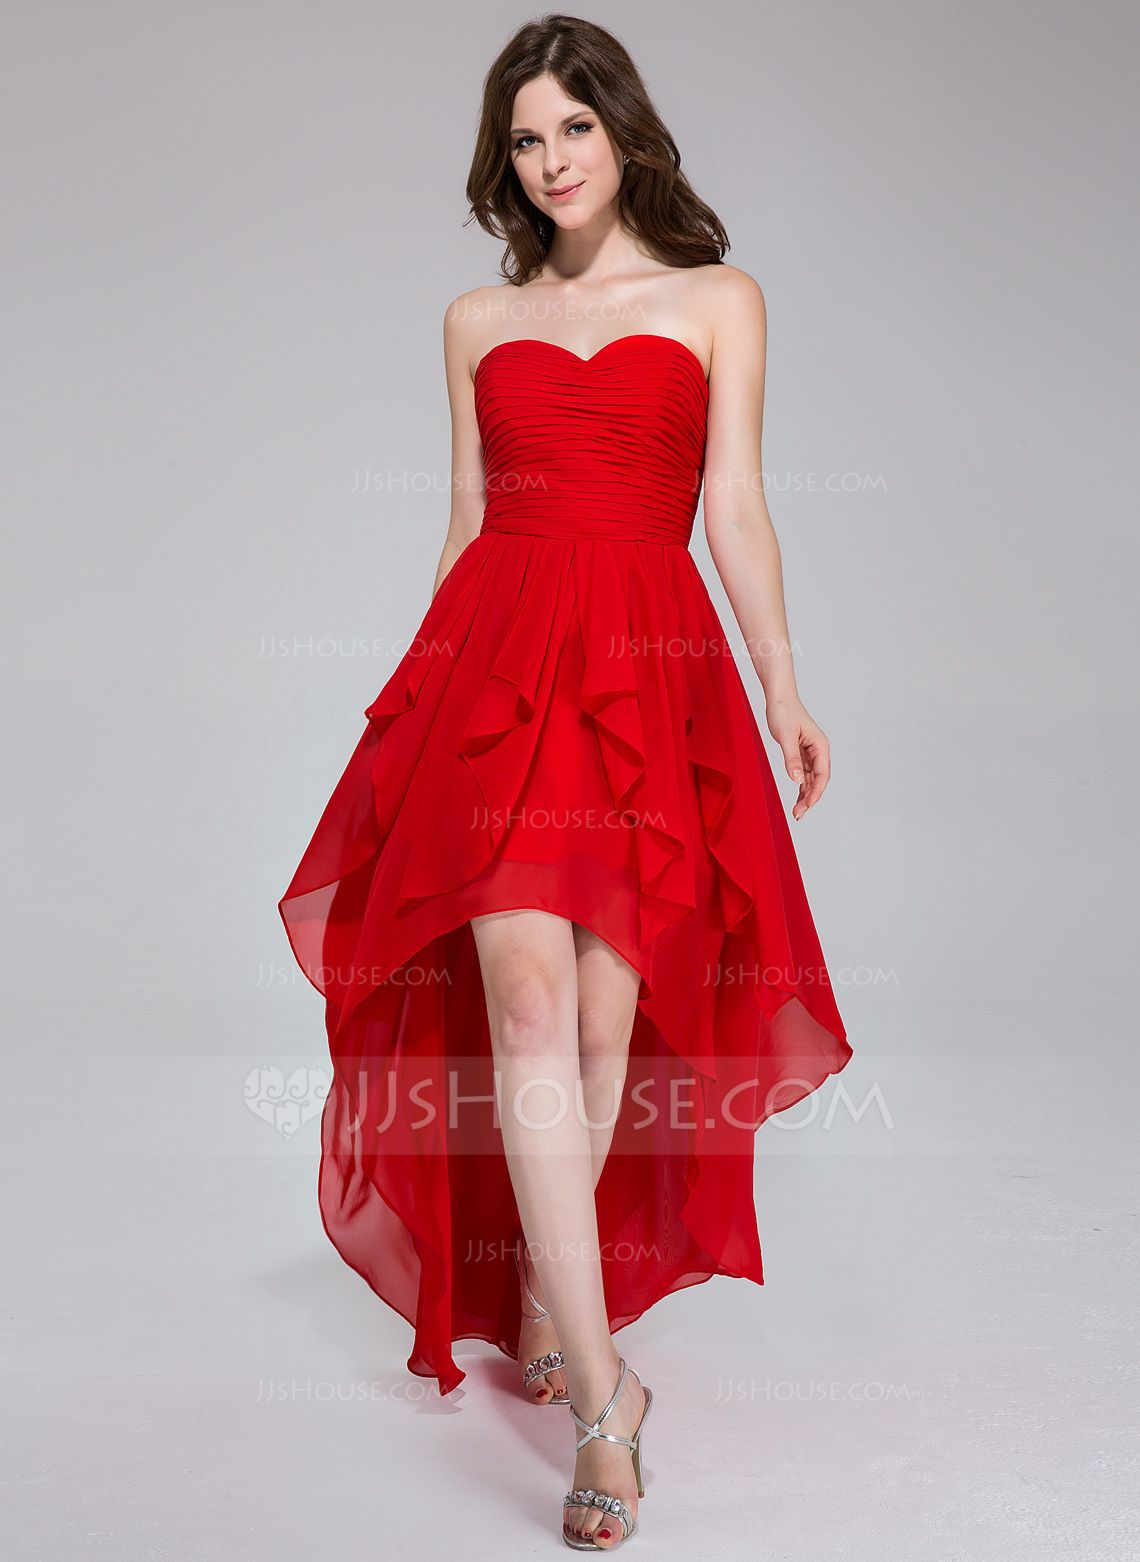 Forme princesse bustier en coeur tra ne asym trique robe - Robe d hotesse grande taille ...